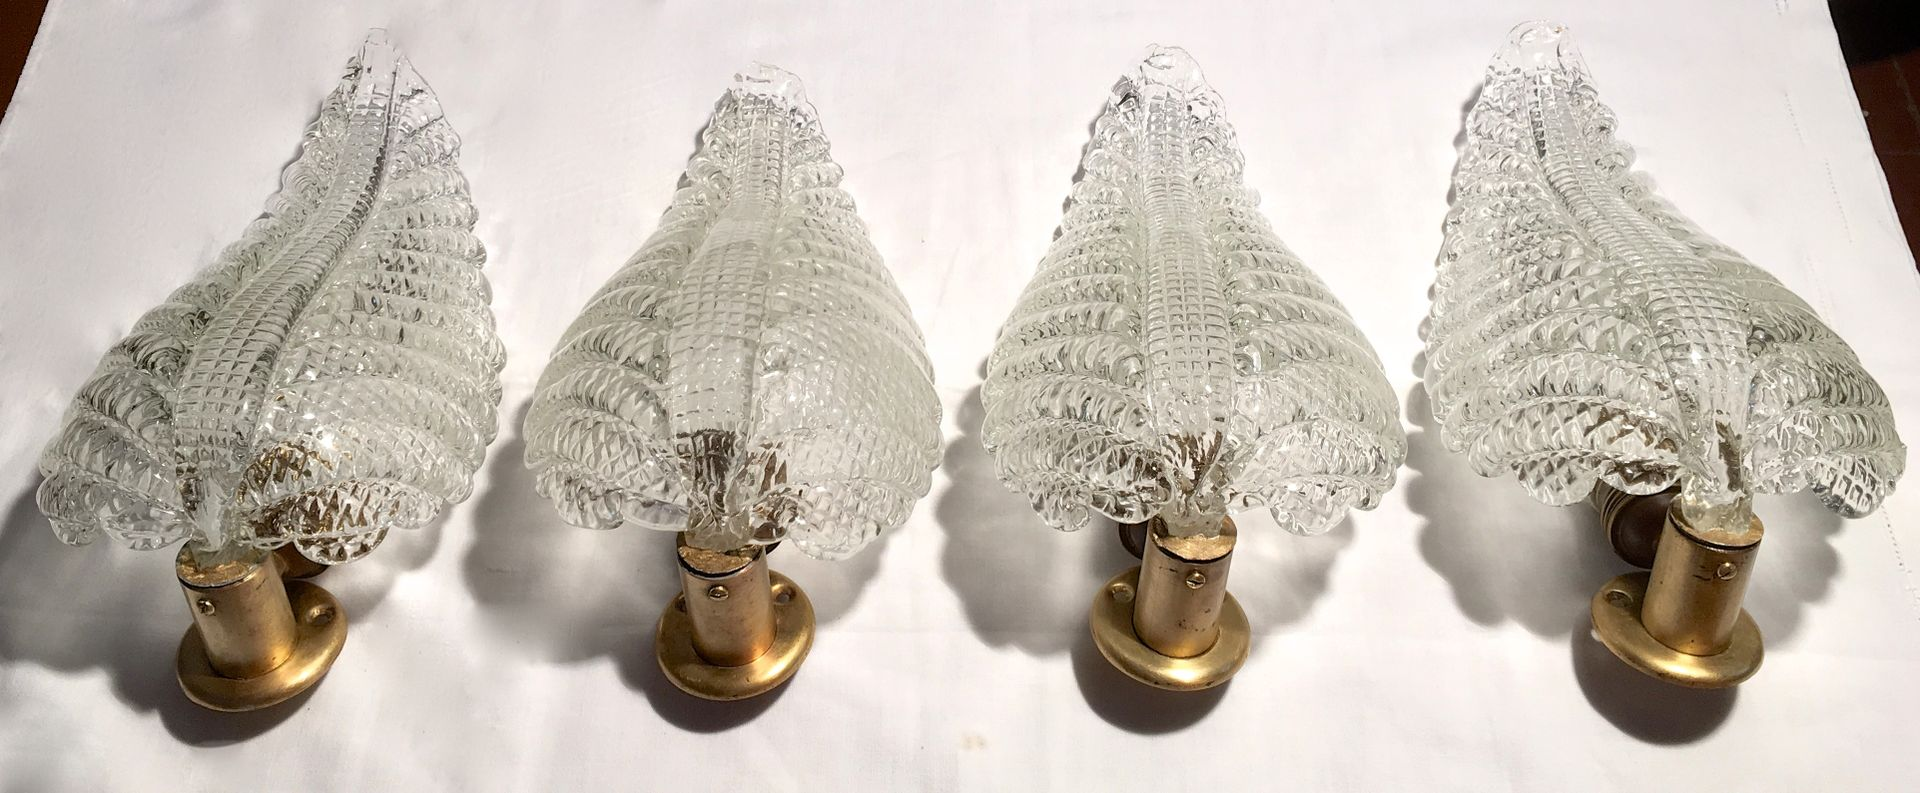 Gro e italienische wandlampe in pflanzenblatt optik von for Barovier e toso